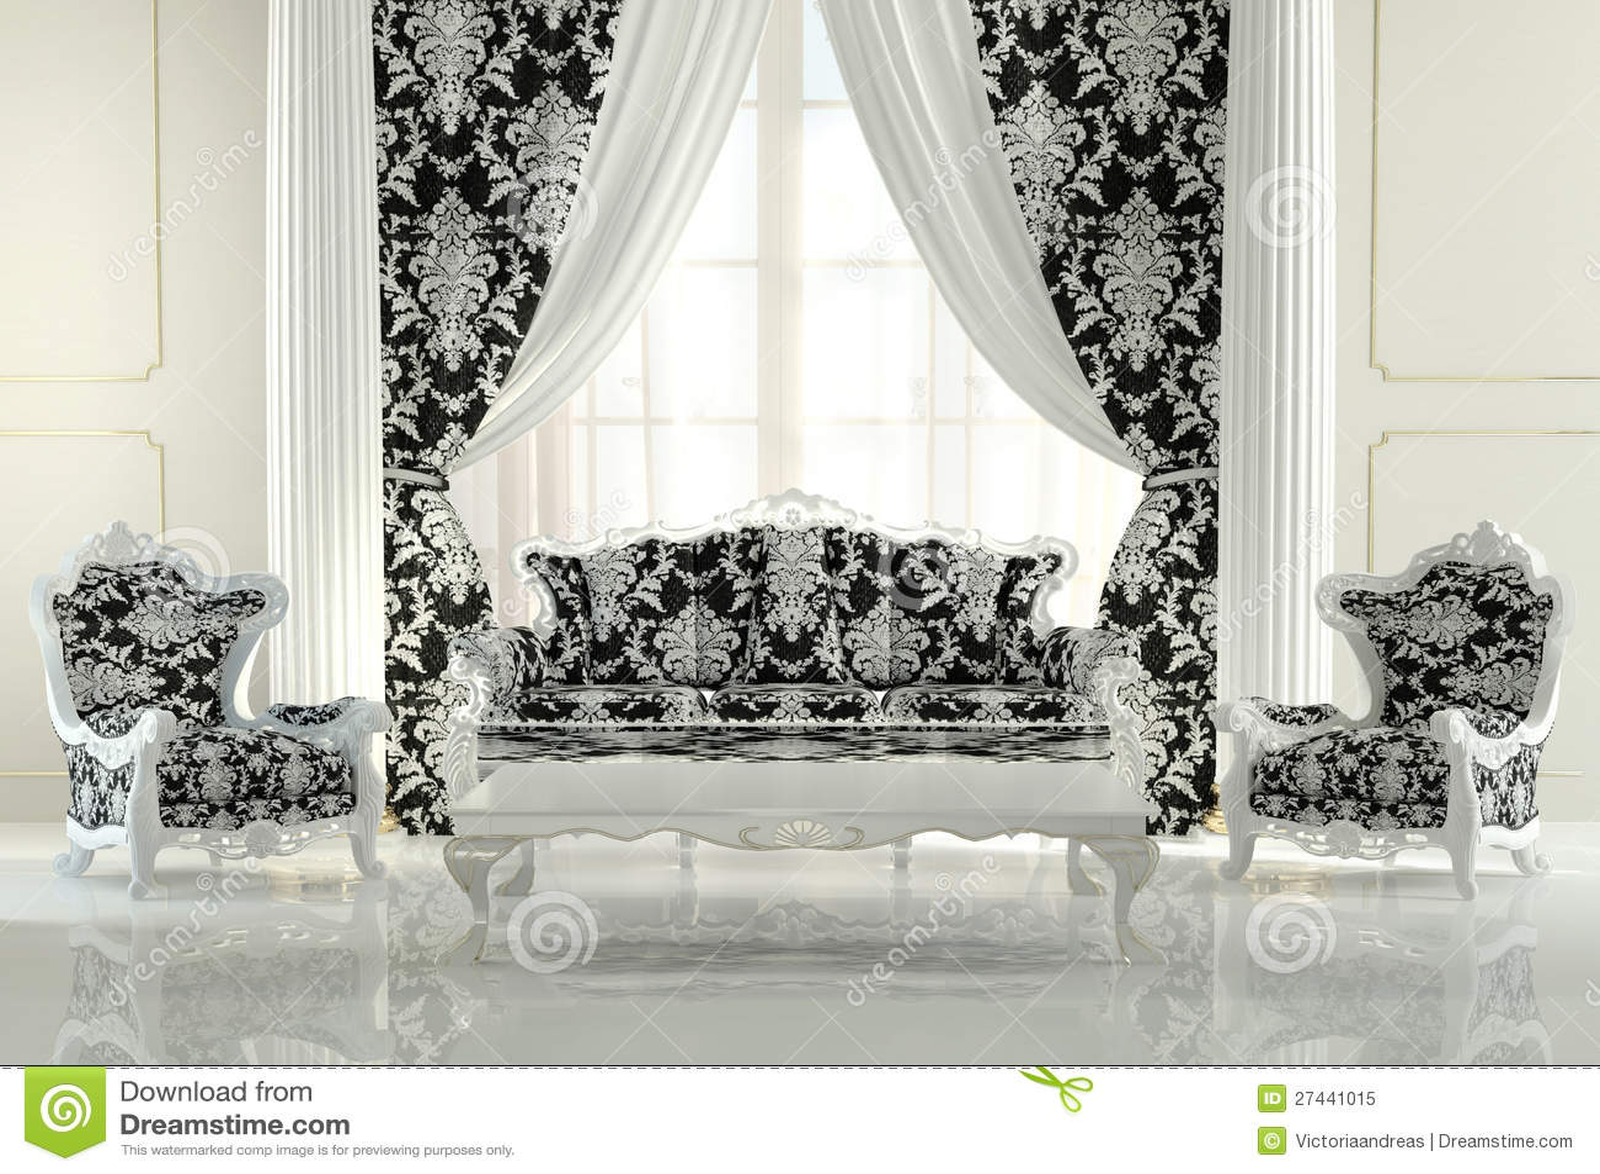 Modern Furniture In Baroque Design Royalty Free Stock Photo Image 27441015